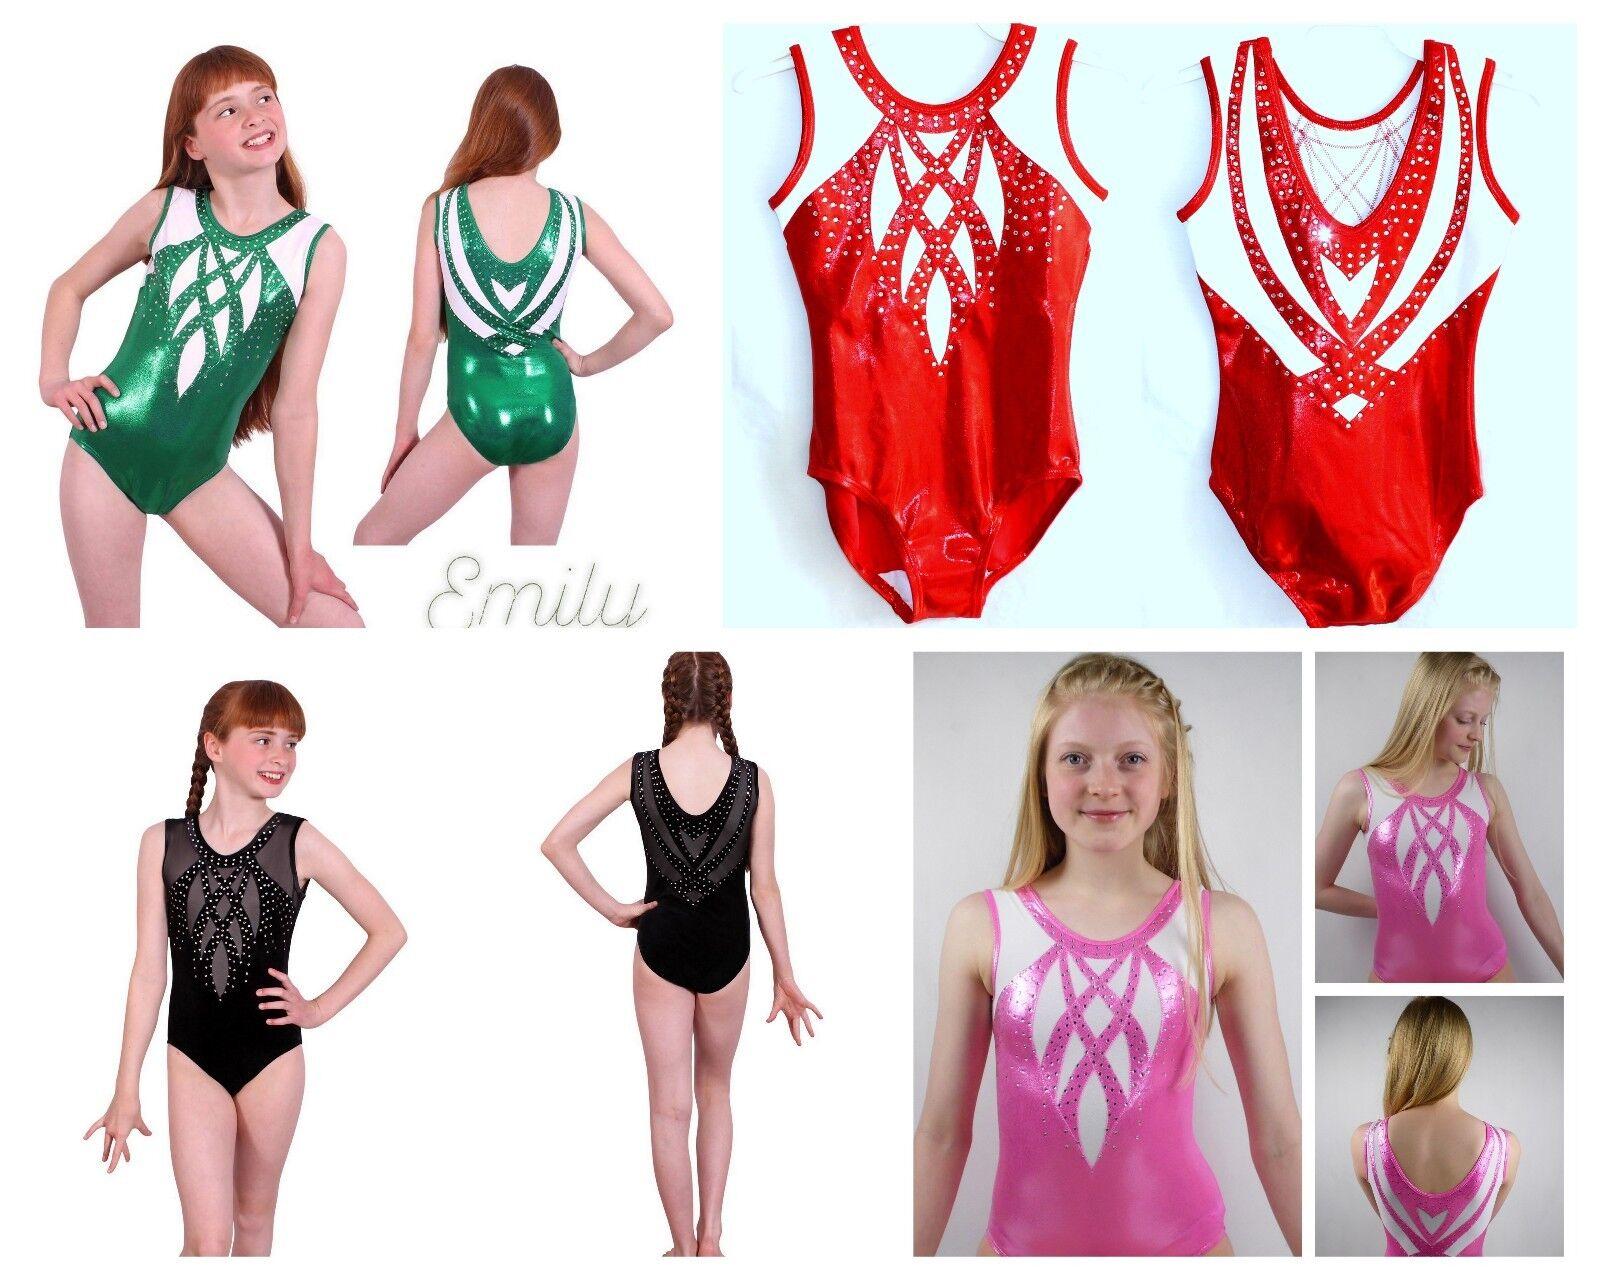 Emily girls Gymnastics leotard - Trampoline Acro Acrobatics Twirling Dance Tap